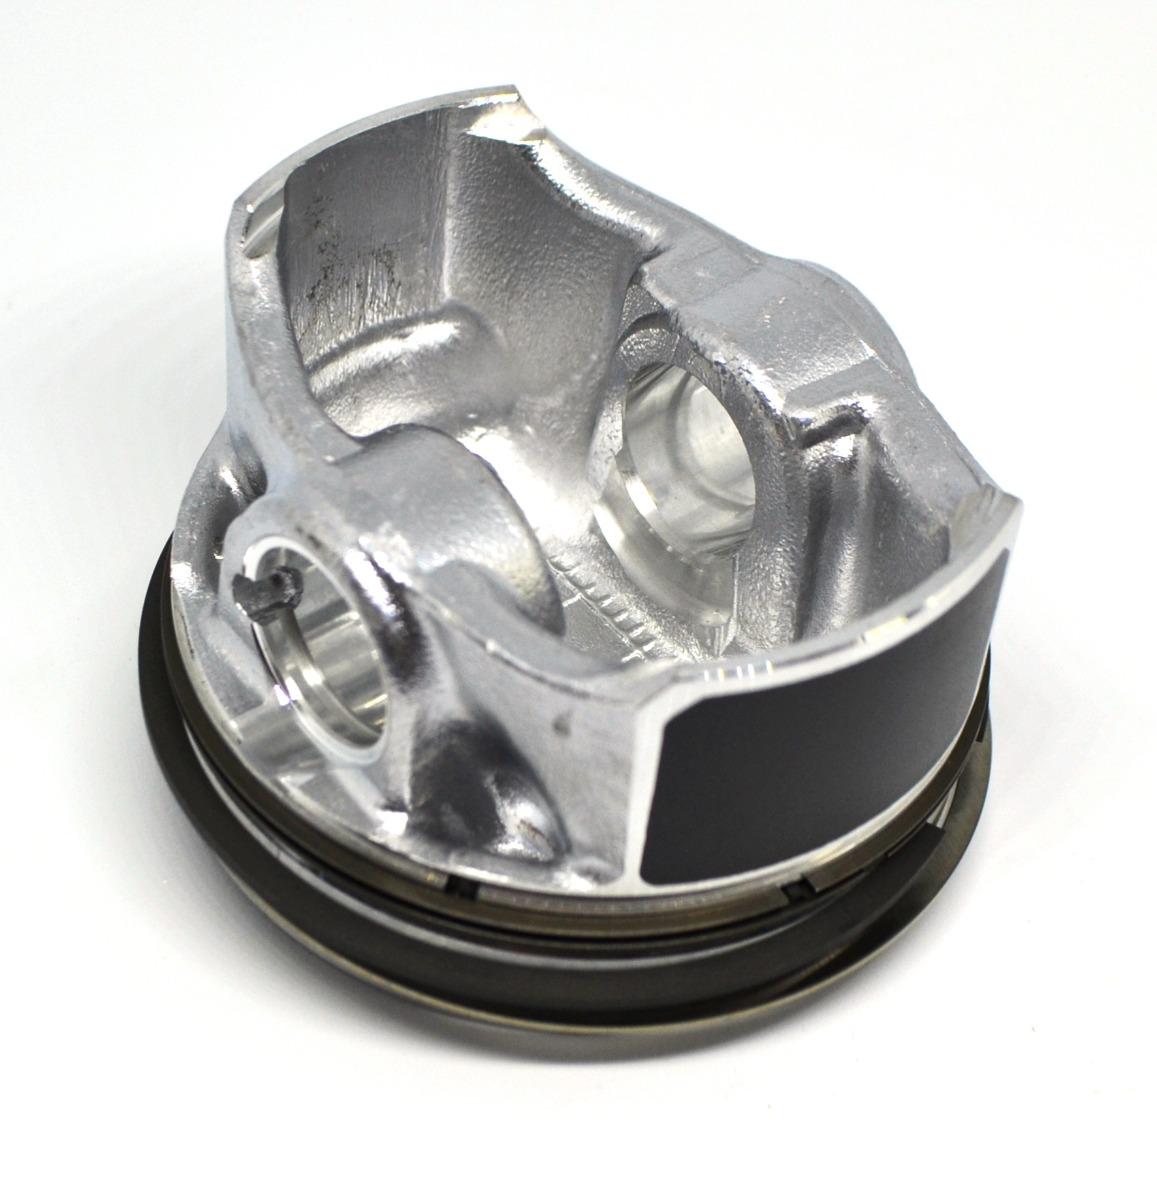 Vauxhall 1.4 16v Z14XEP 0.50mm Oversize piston with rings